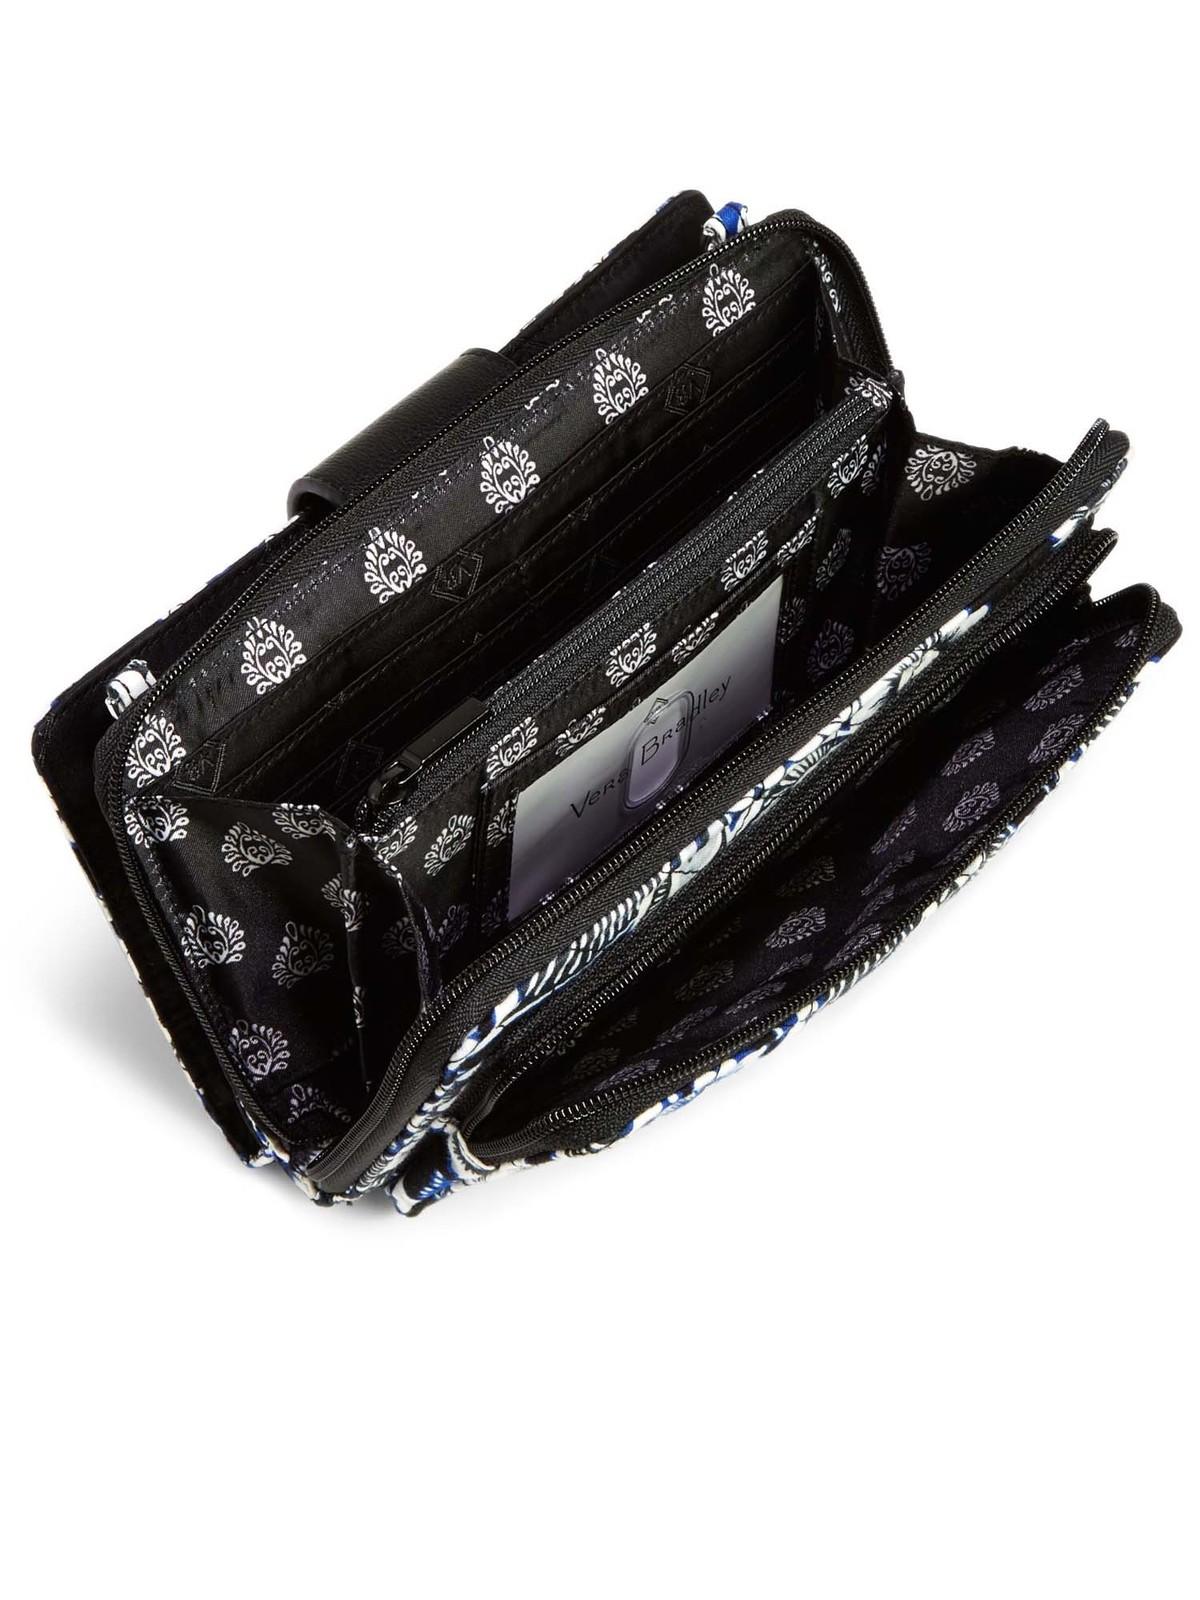 Vera Bradley Iconic Deluxe All Together Crossbody Bag, Snow Lotus